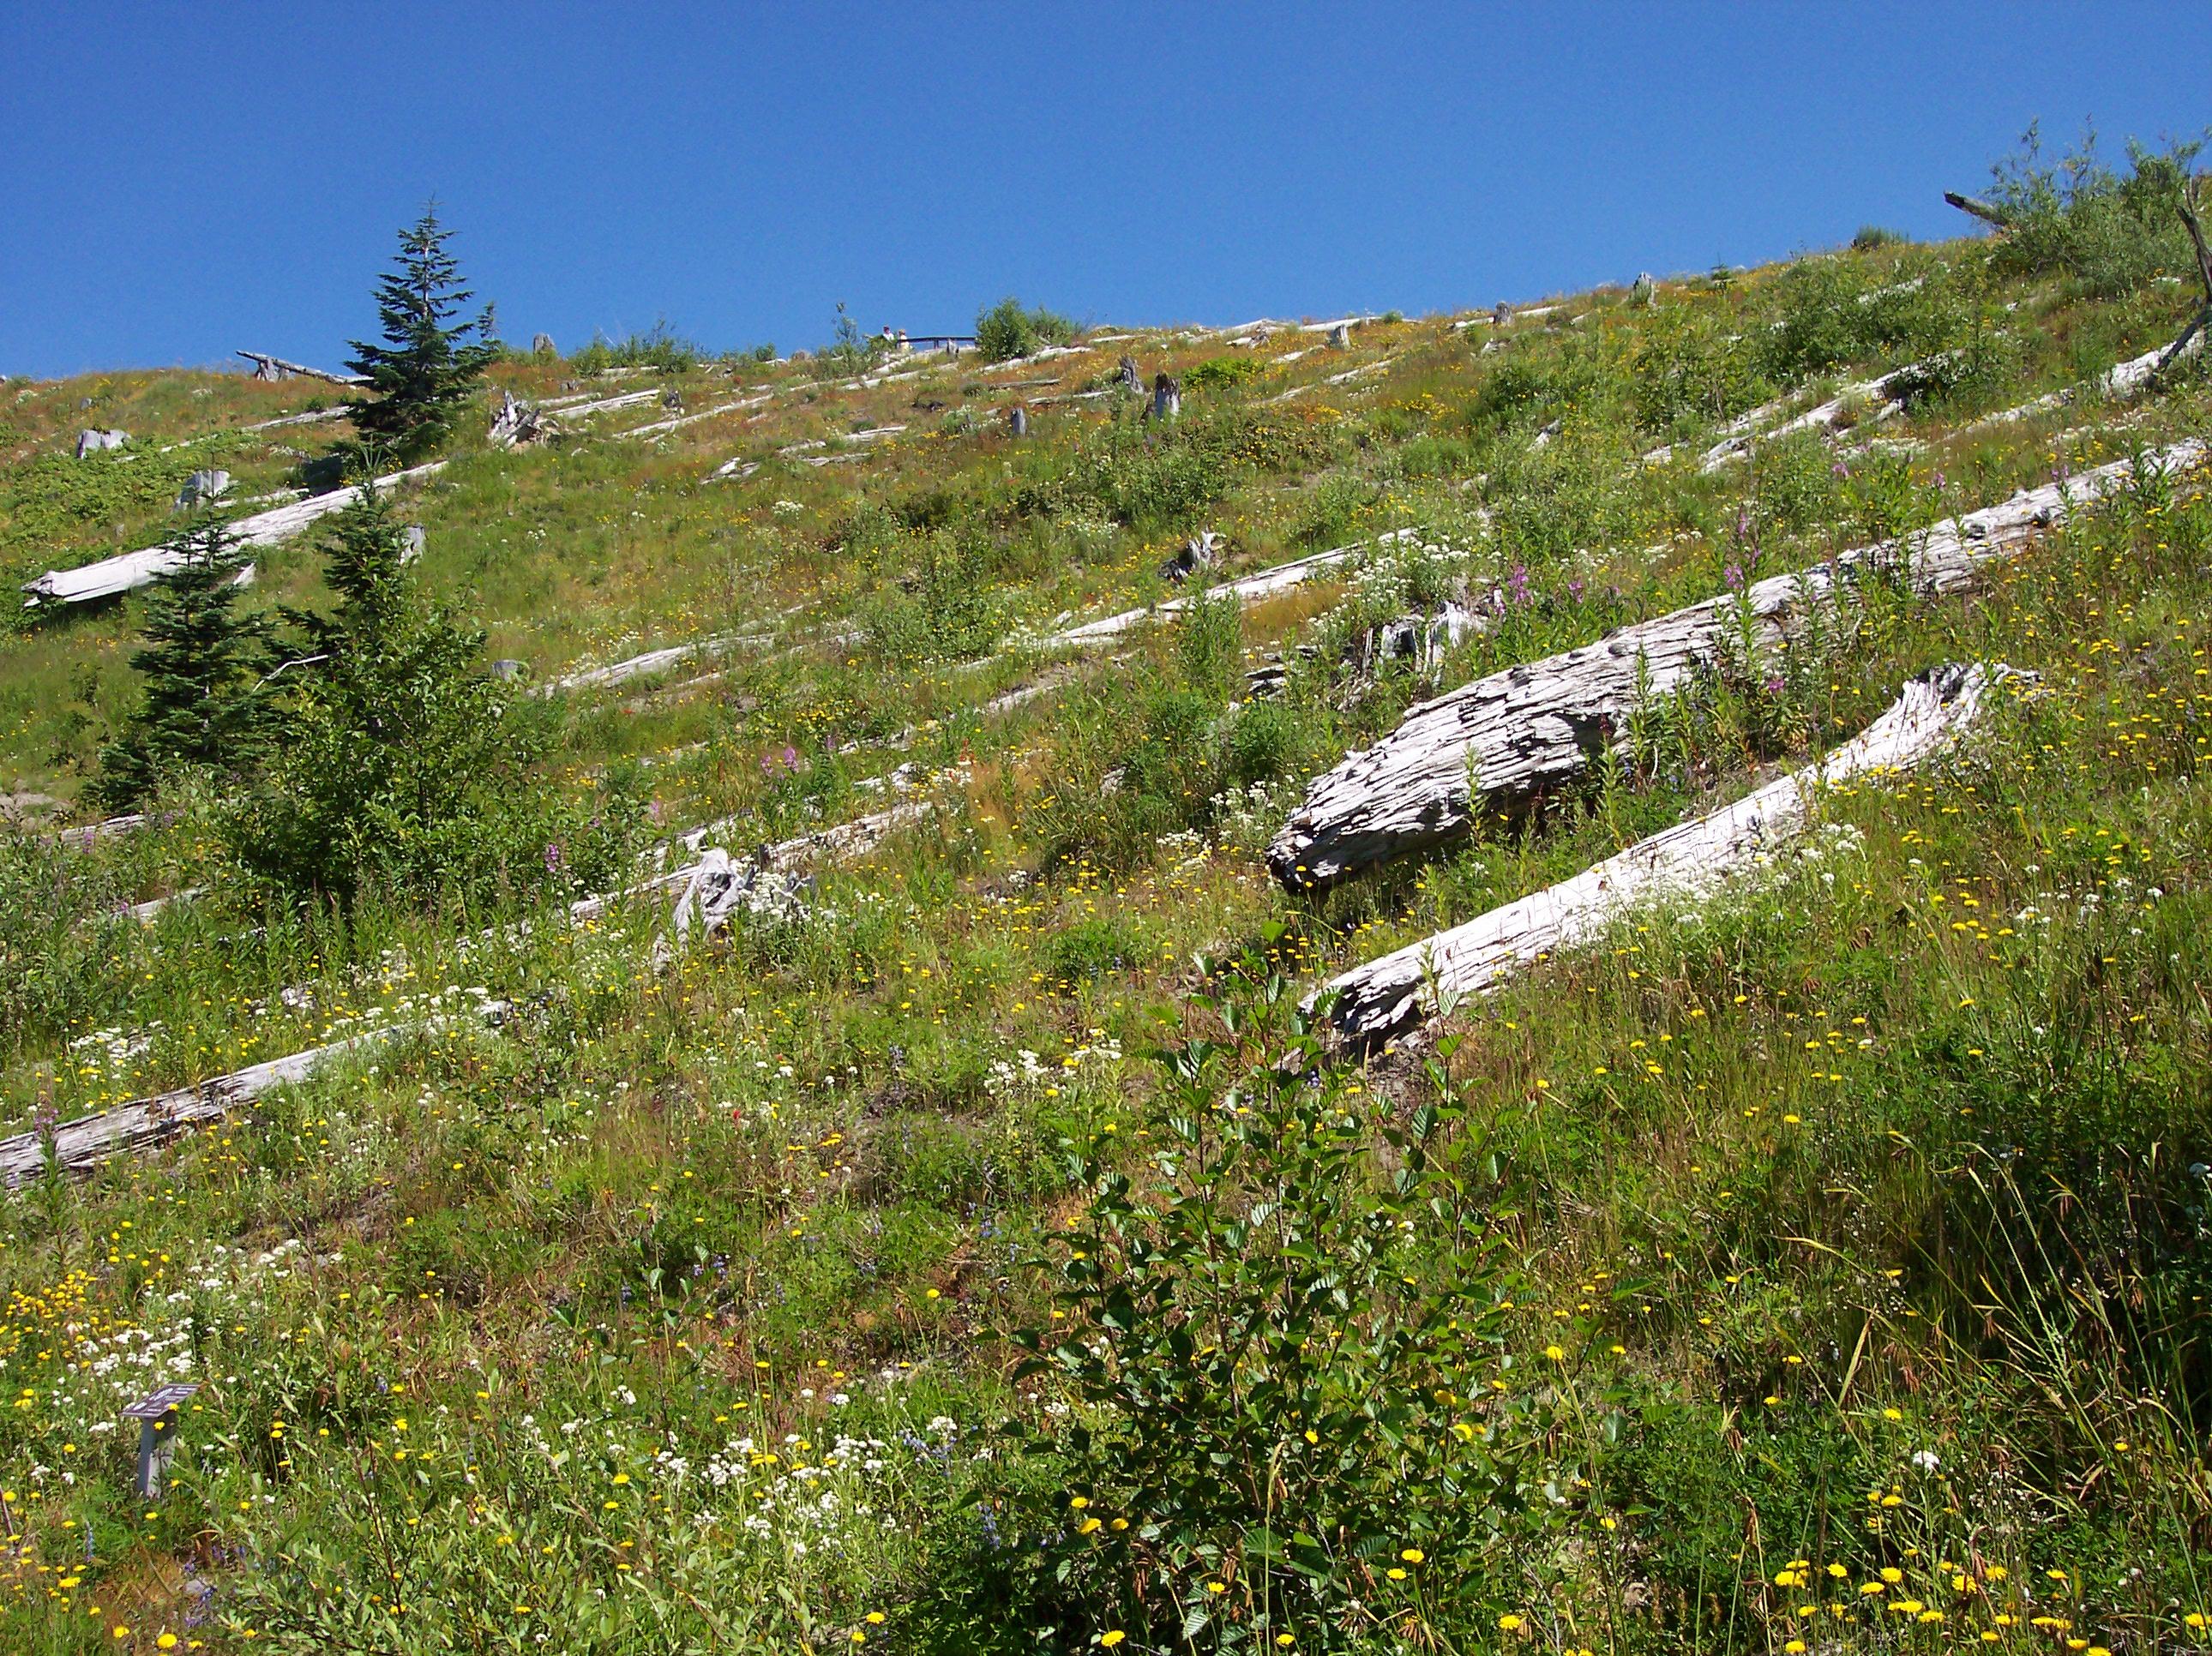 Mt_st_helens_Johnston_ridge_25_years_later.jpg